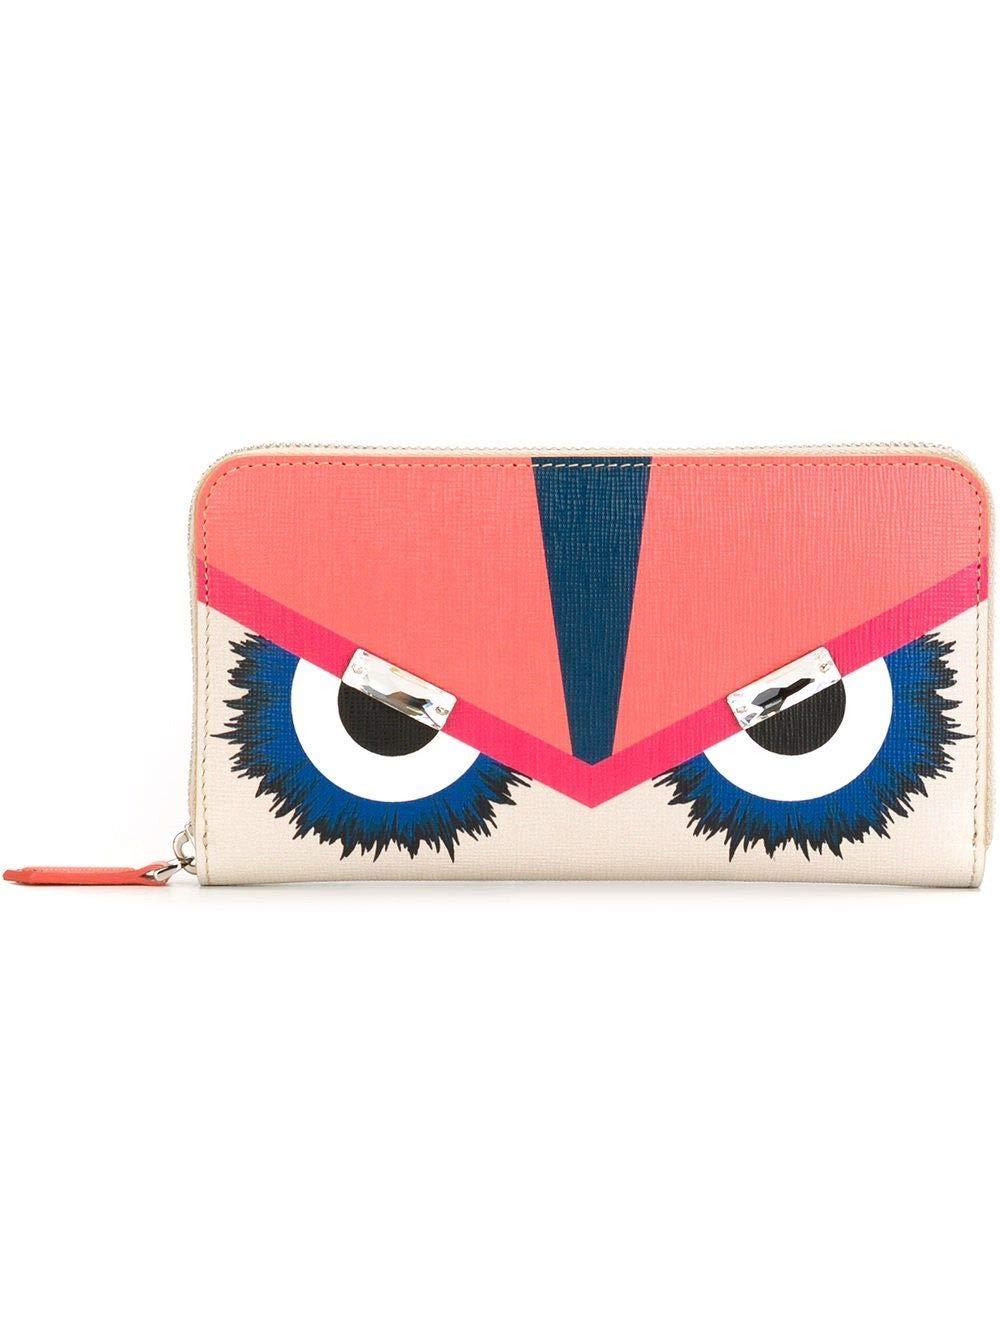 Fendi Women's 8M02997jnf02lz-Mcf Pink Leather Wallet